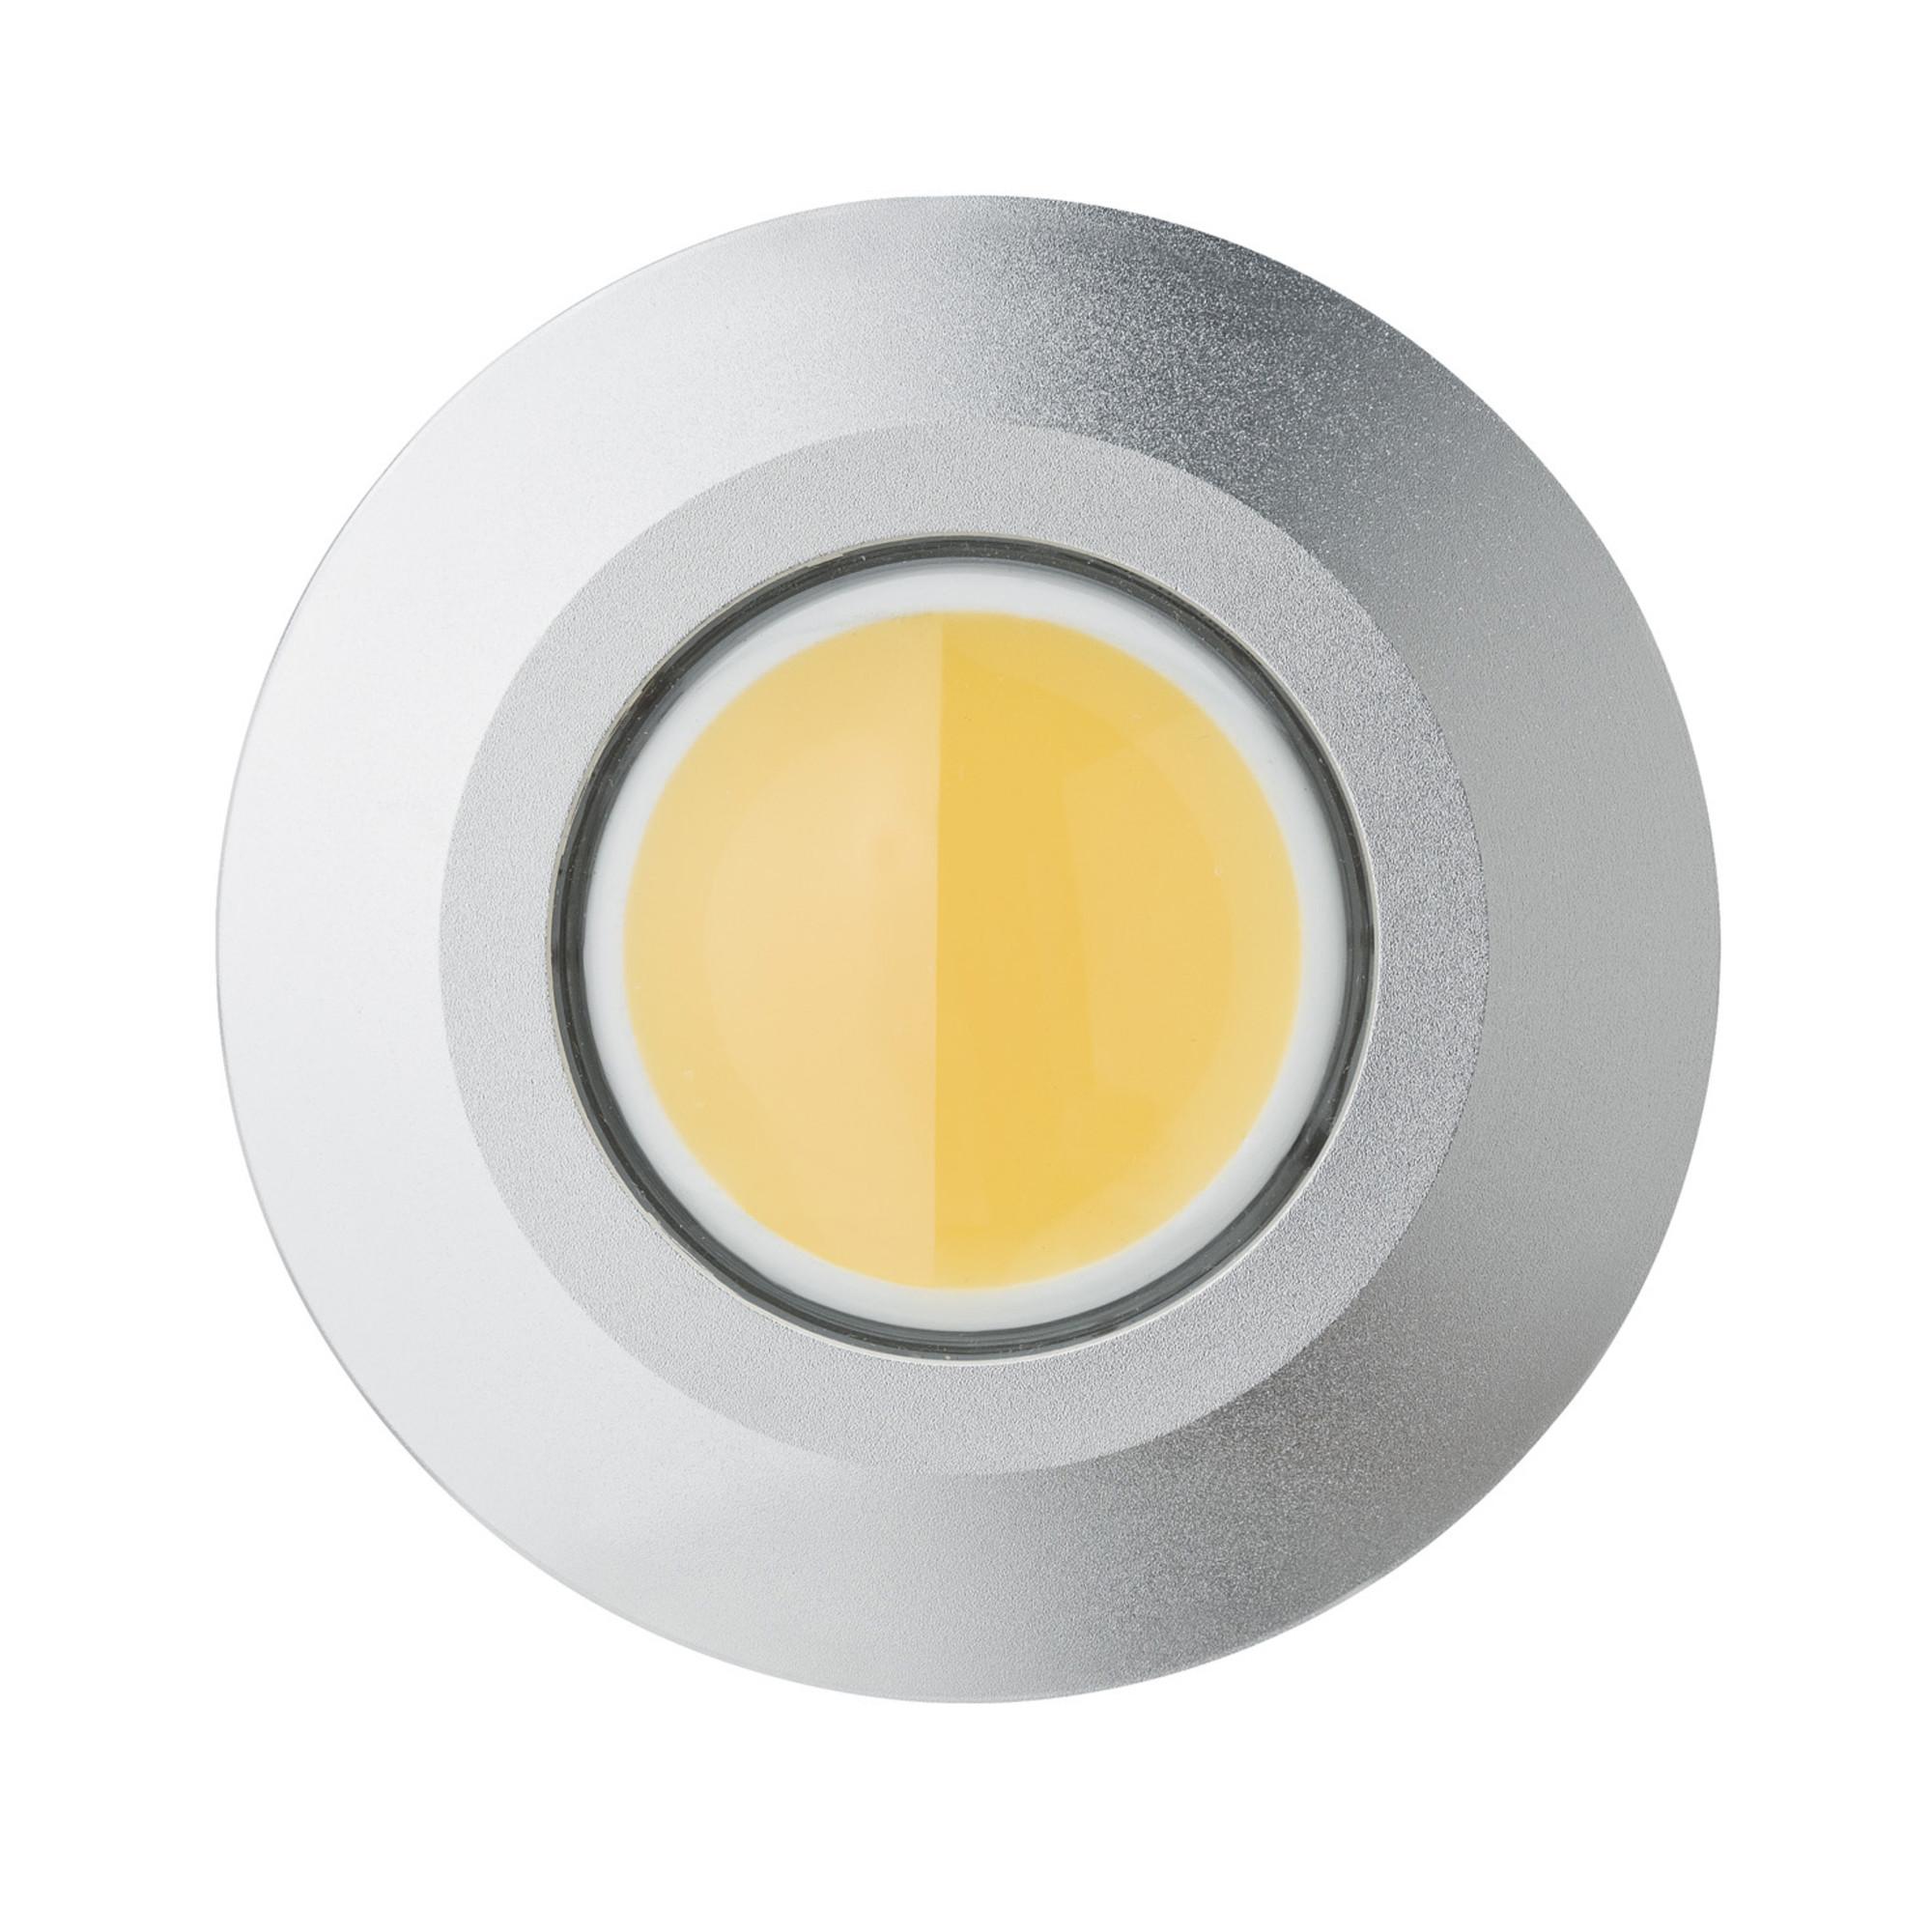 Лампа светодиодная Paulmann 28131 GX53 210 Лм теплый свет